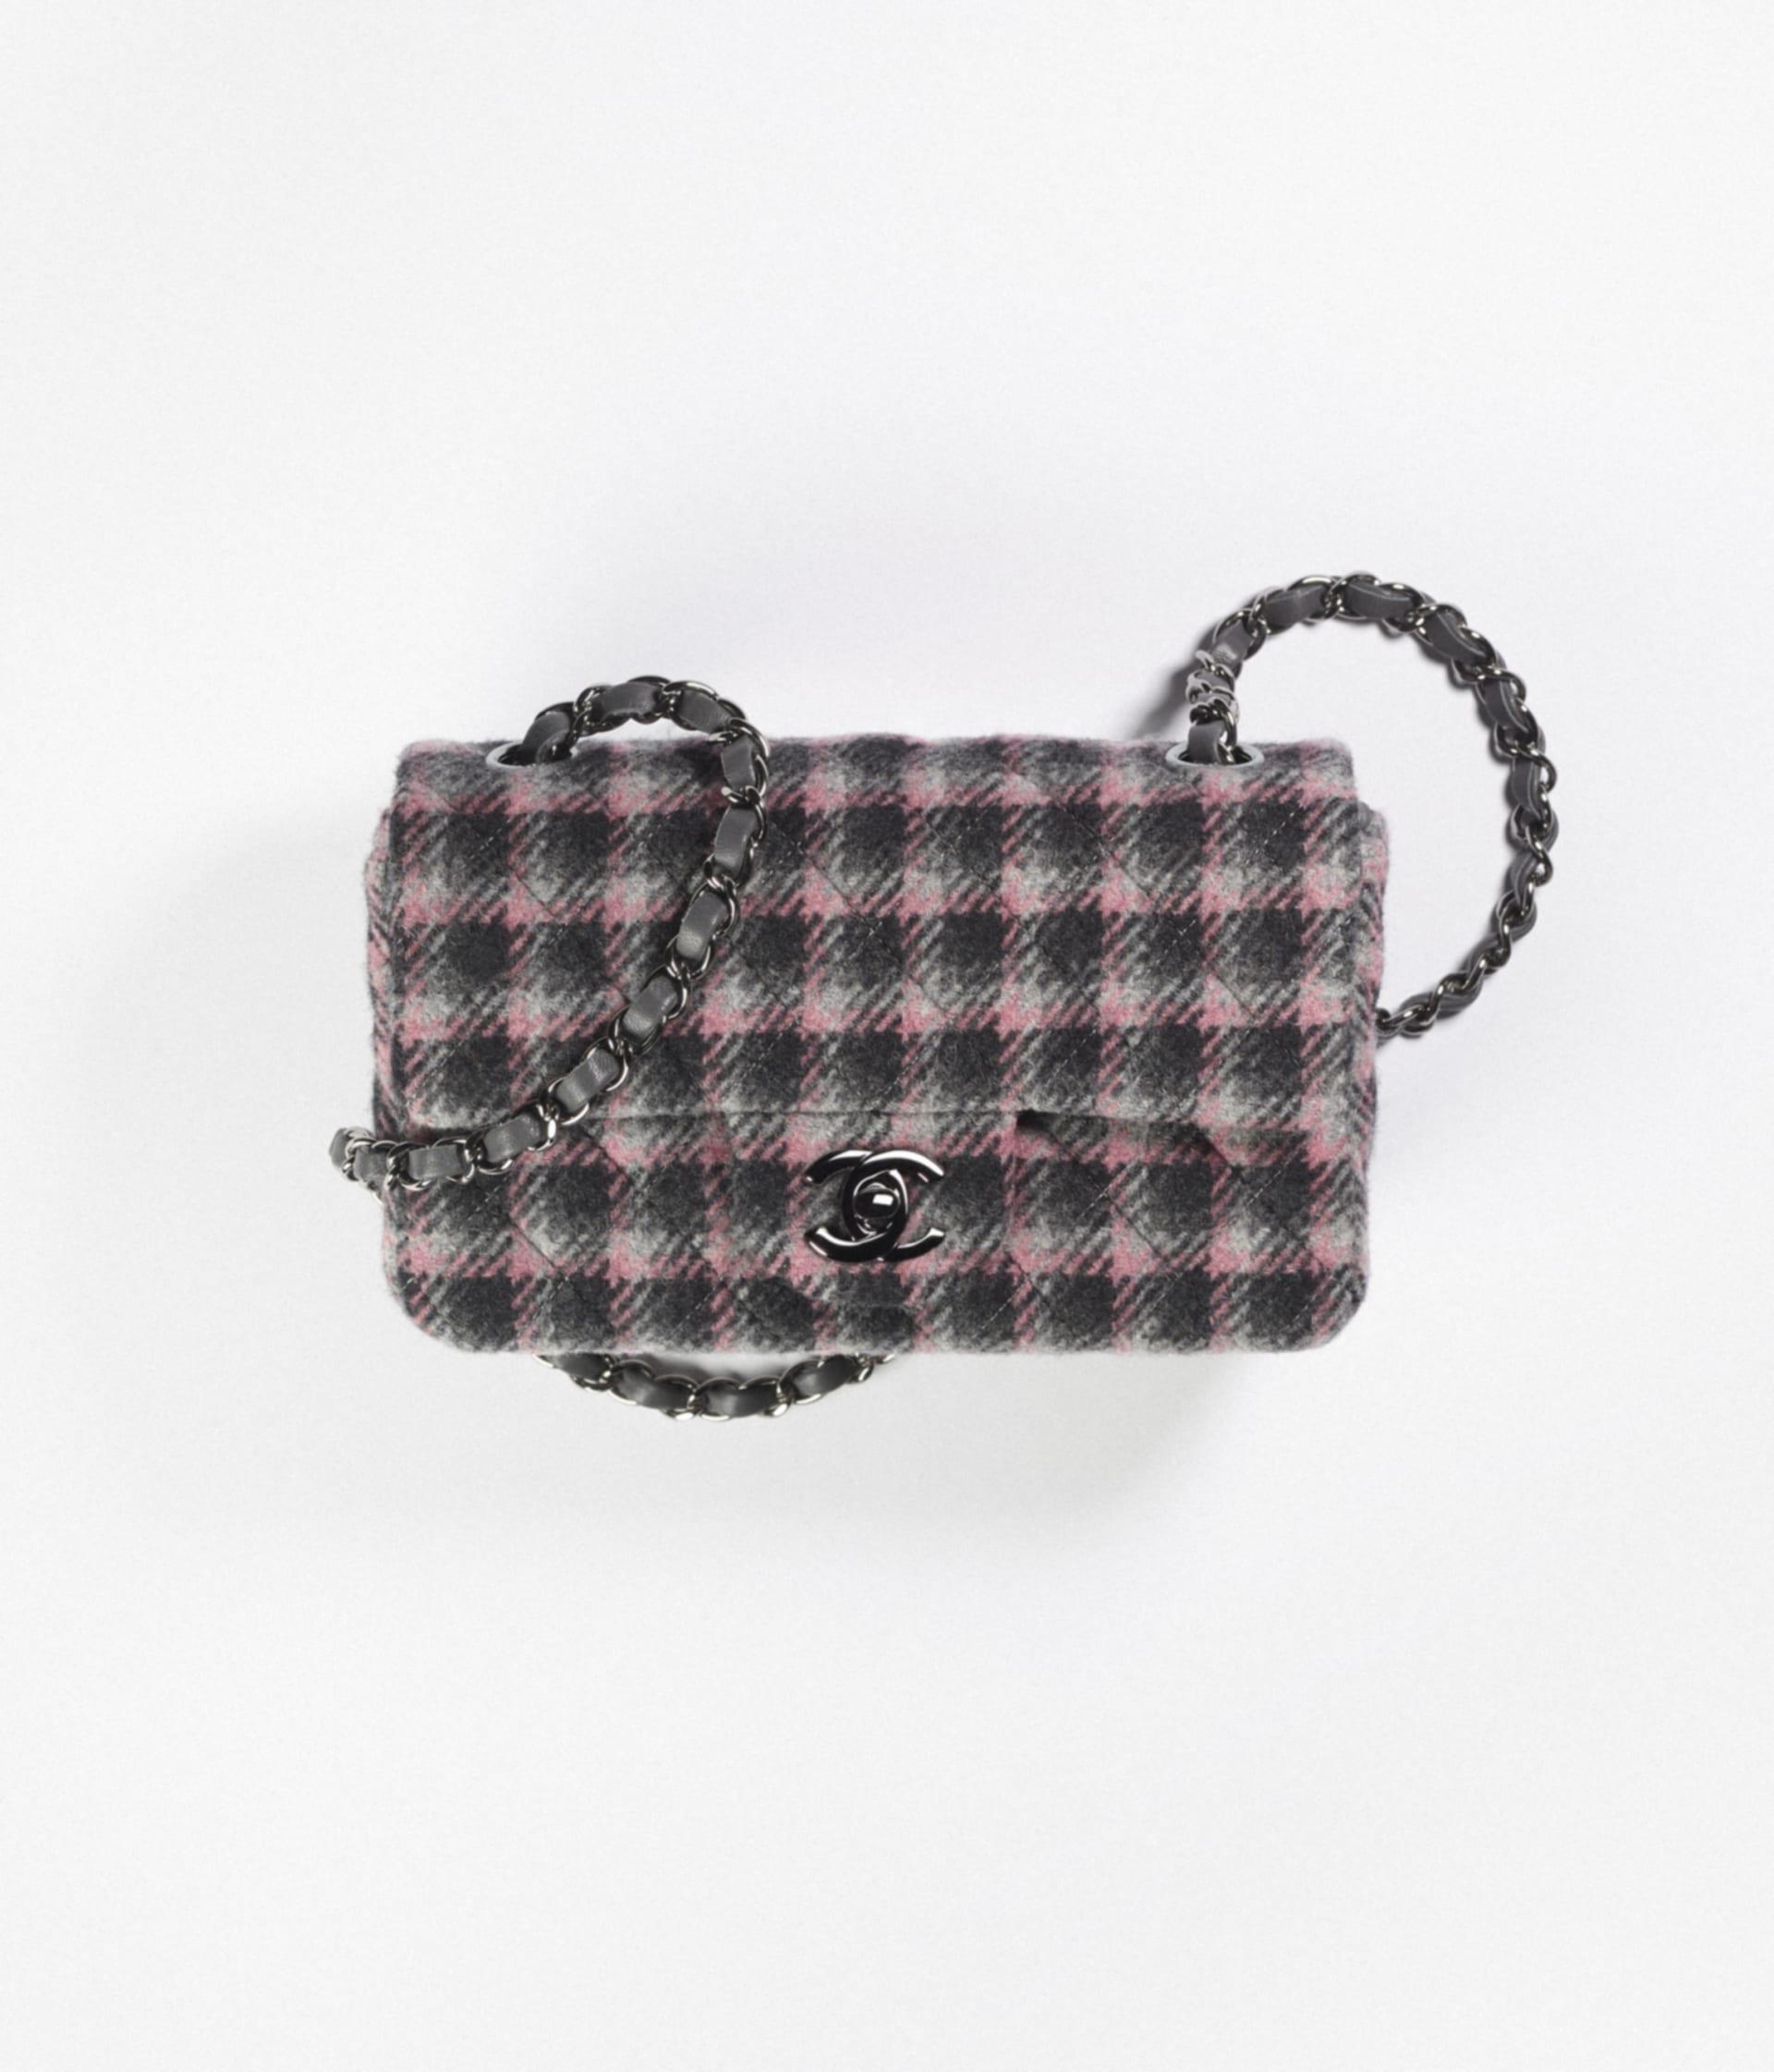 image 1 - Mini Flap Bag - Wool Tweed & Ruthenium-Finish Metal - Black, Pink & Gray